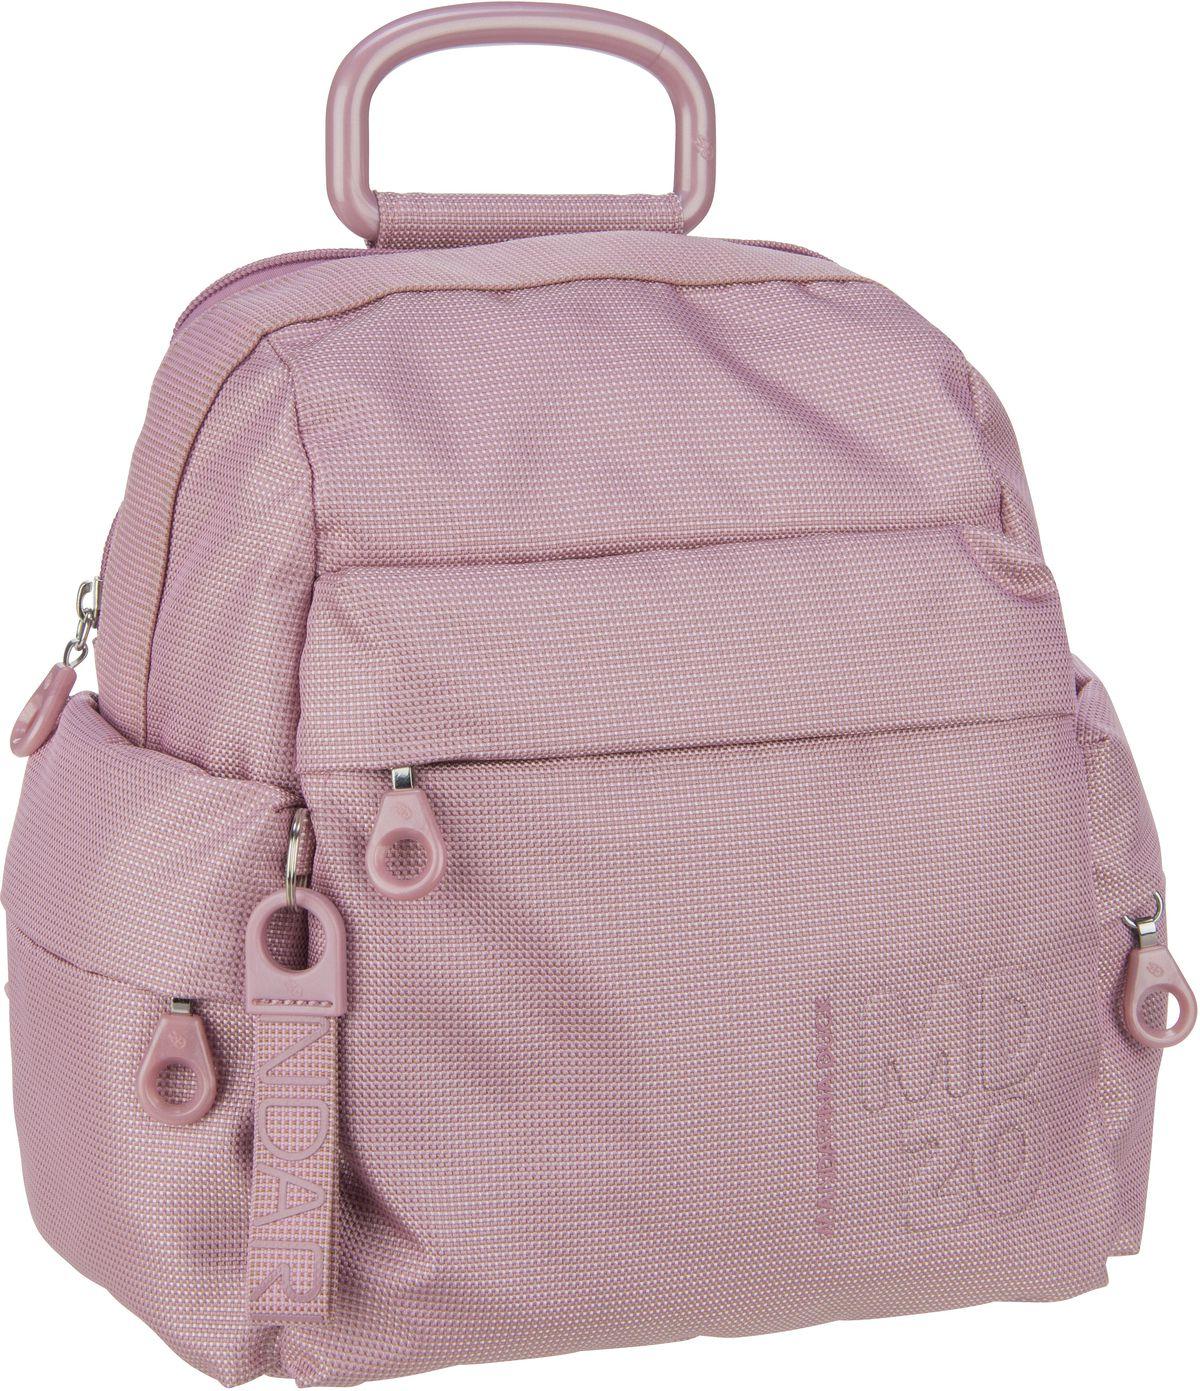 mandarina duck -  Rucksack / Daypack MD20 Small Backpack QMTT1 Lotus